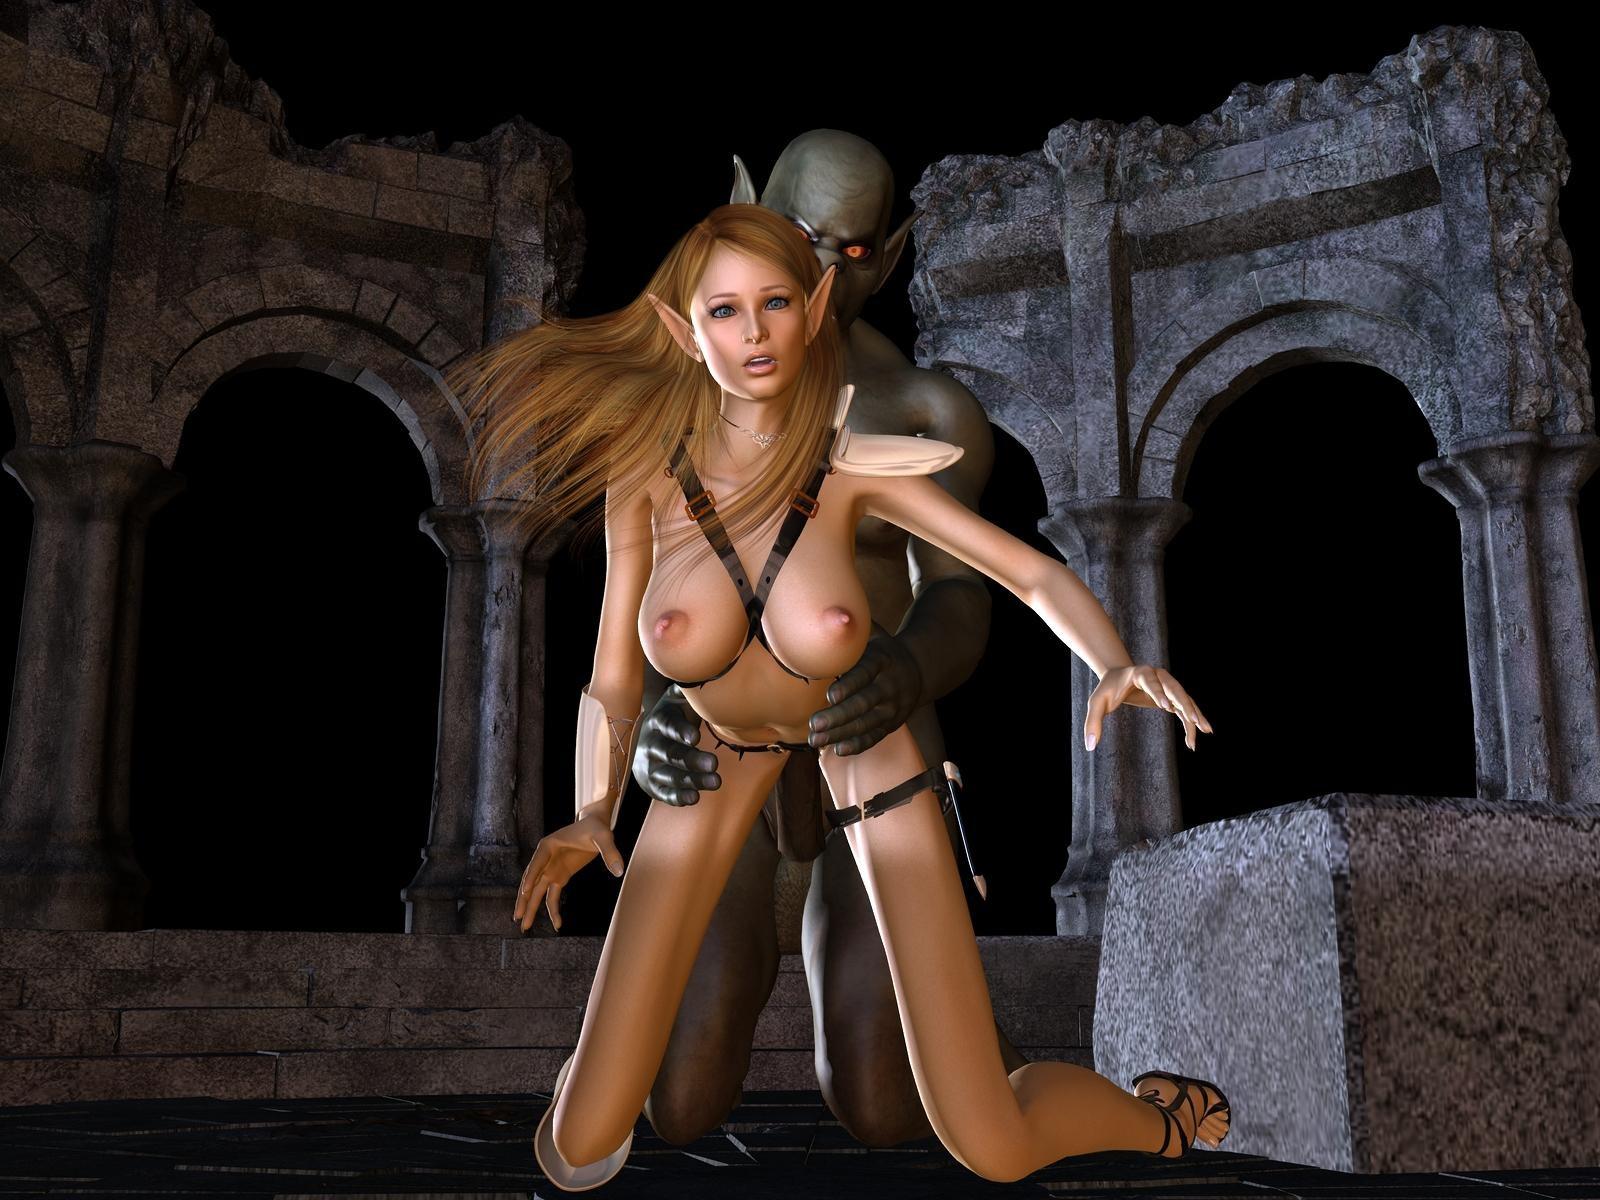 Porncraft lara croft free nackt amateurs sexygirls